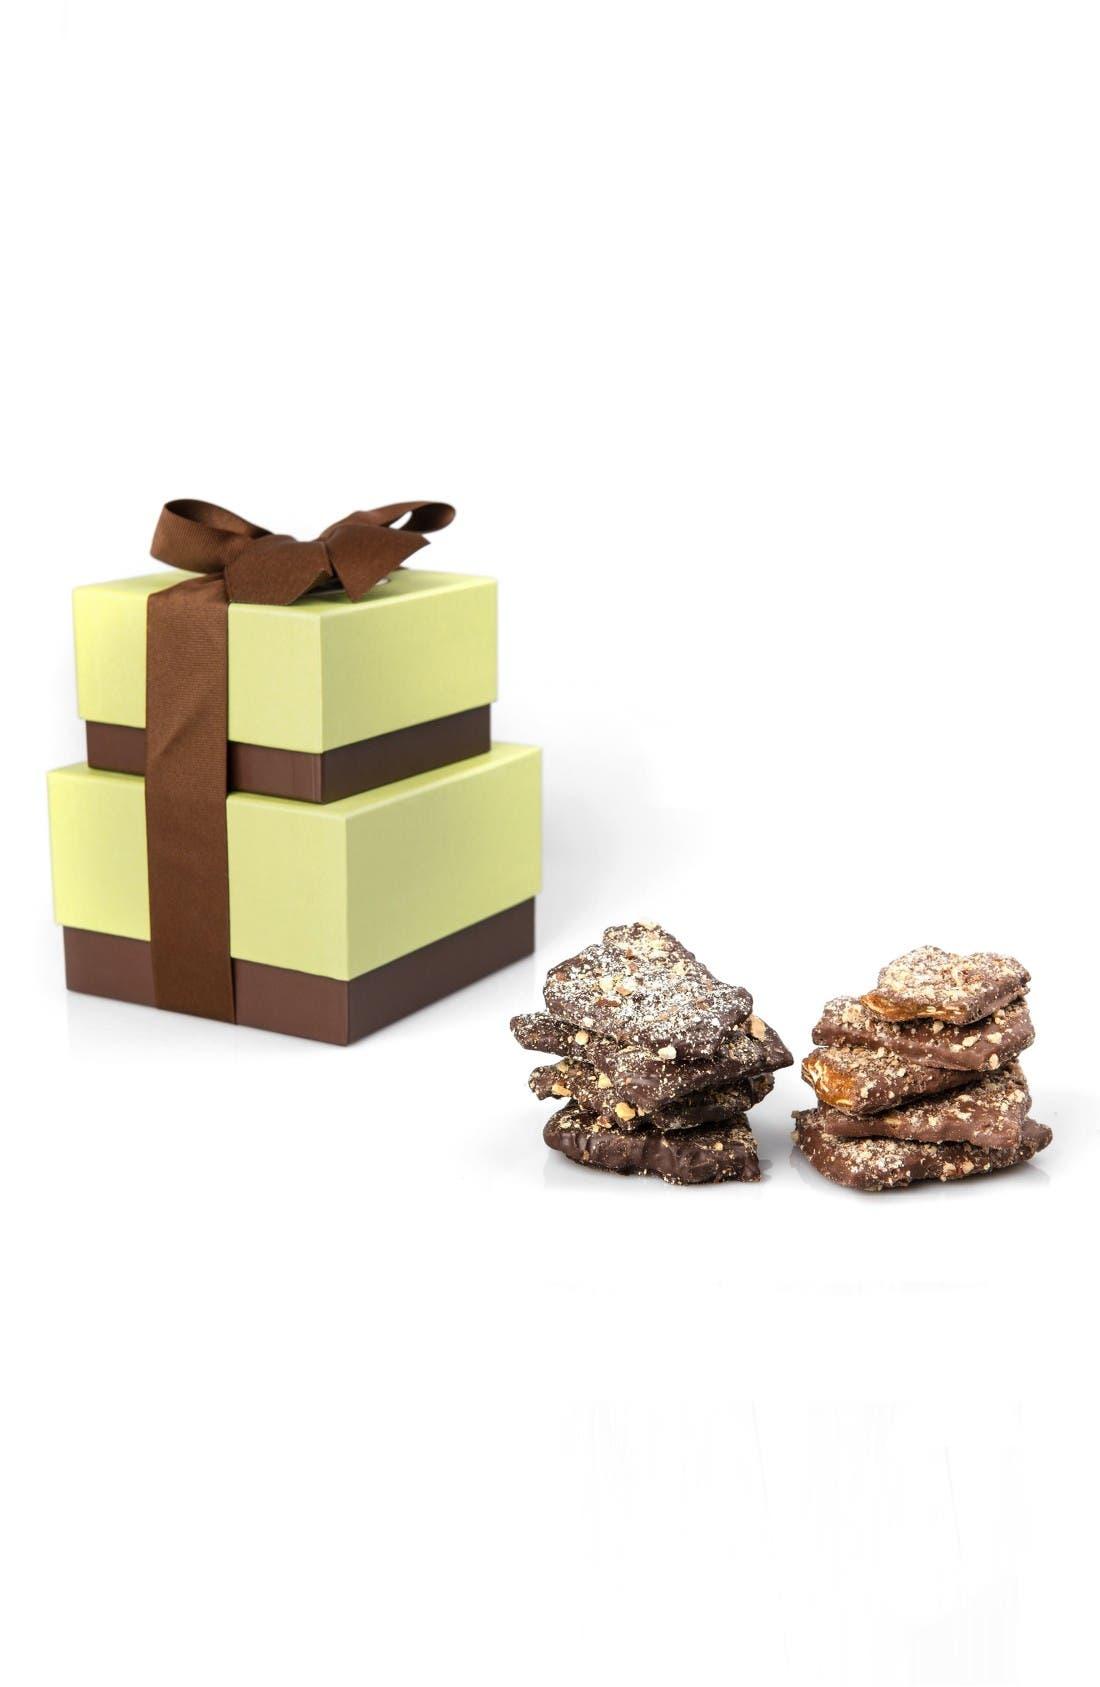 Alternate Image 1 Selected - The Toffee Box Dark Chocolate Almond & Milk Chocolate Pecan Toffee Tower